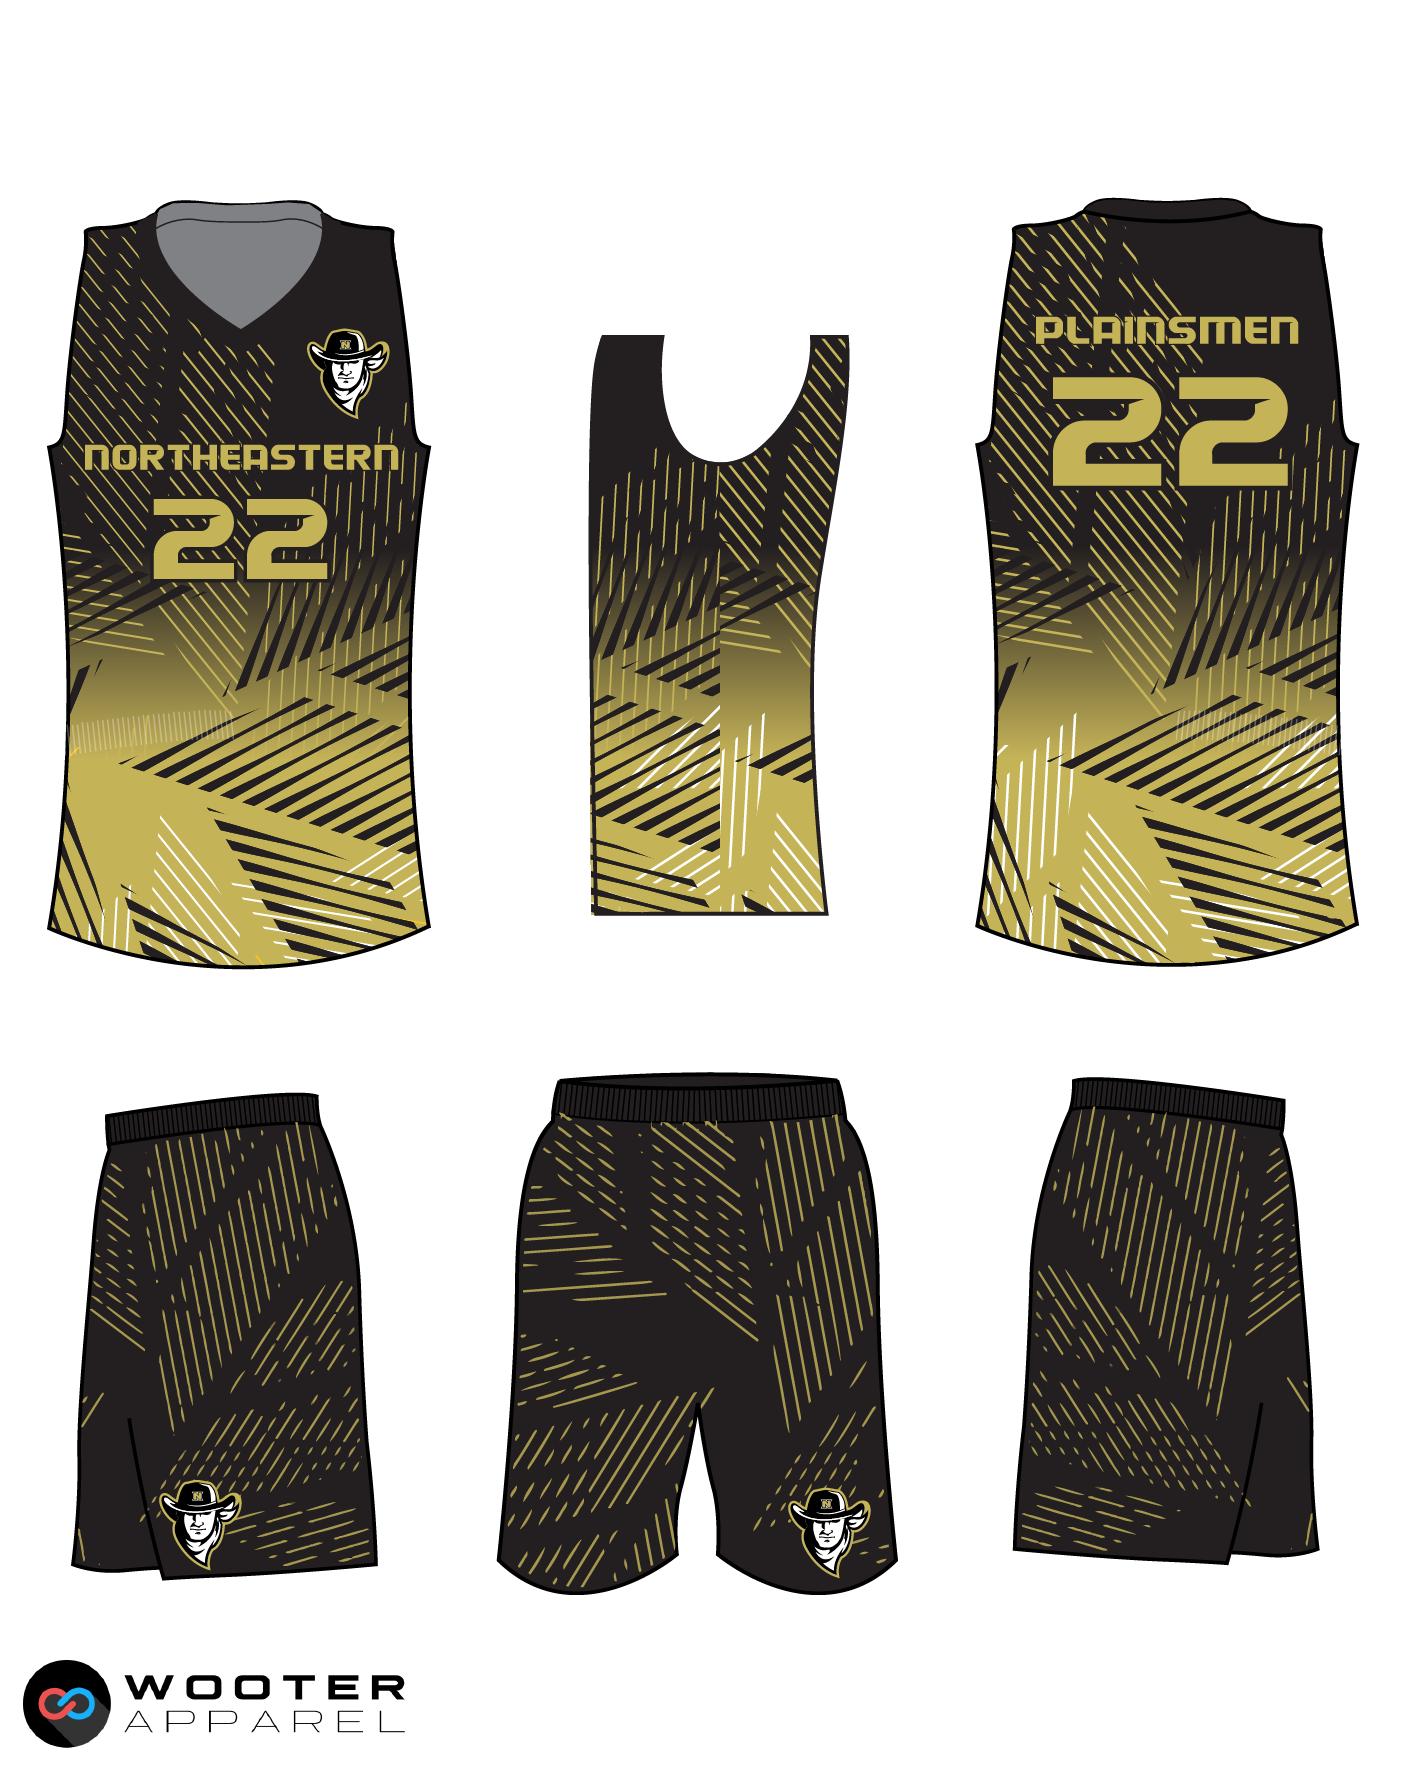 PLAINSMEN black gold white School basketball uniforms jerseys tops, shorts